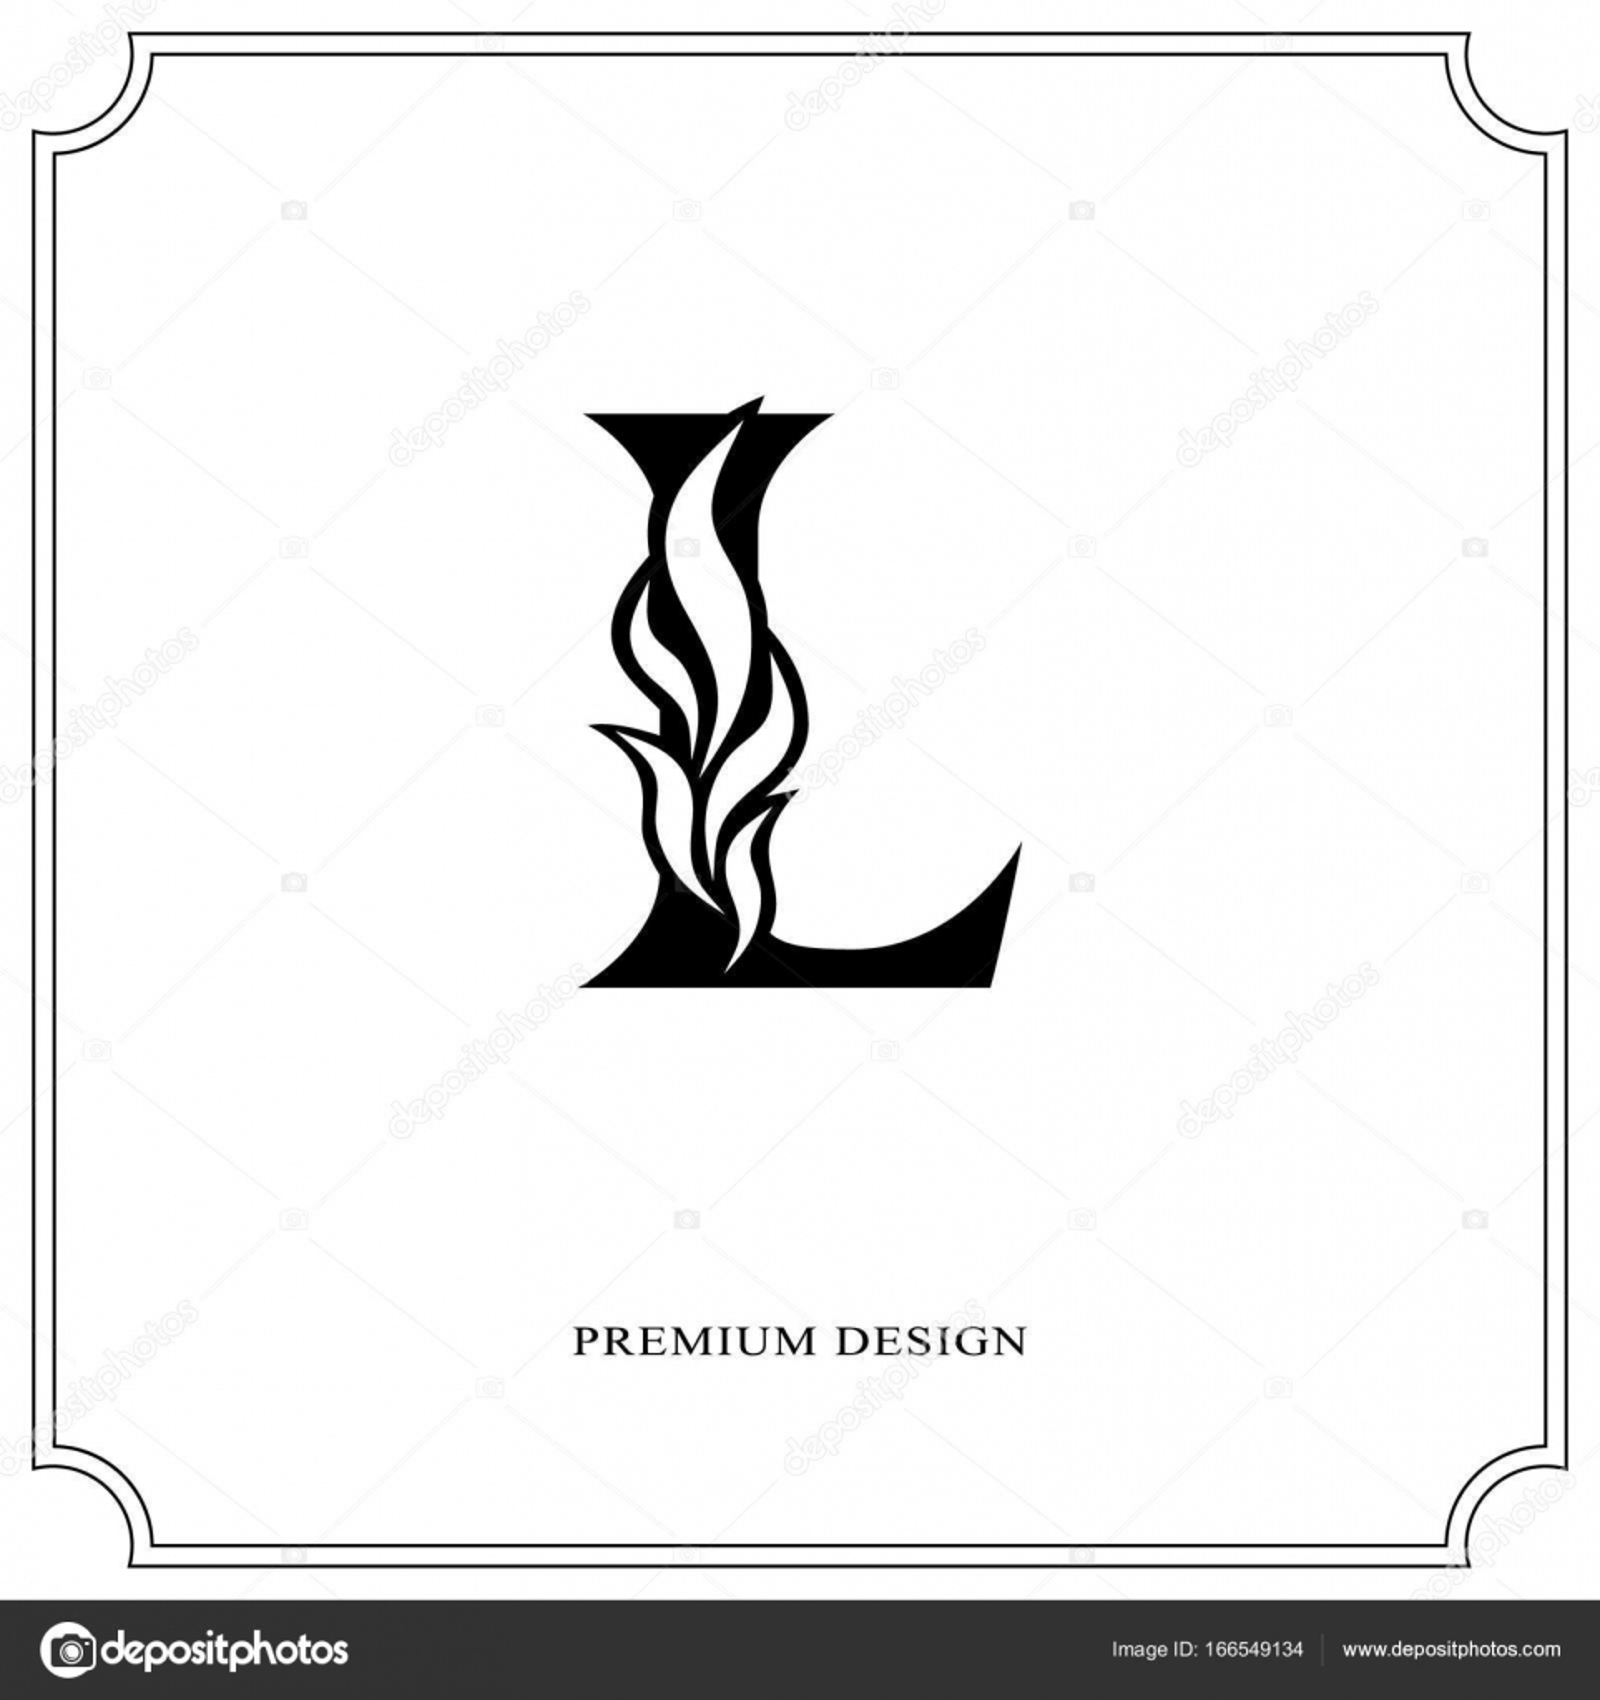 elegant letter l graceful royal style calligraphic beautiful logo vintage drawn emblem for book design brand name business card restaurant boutique